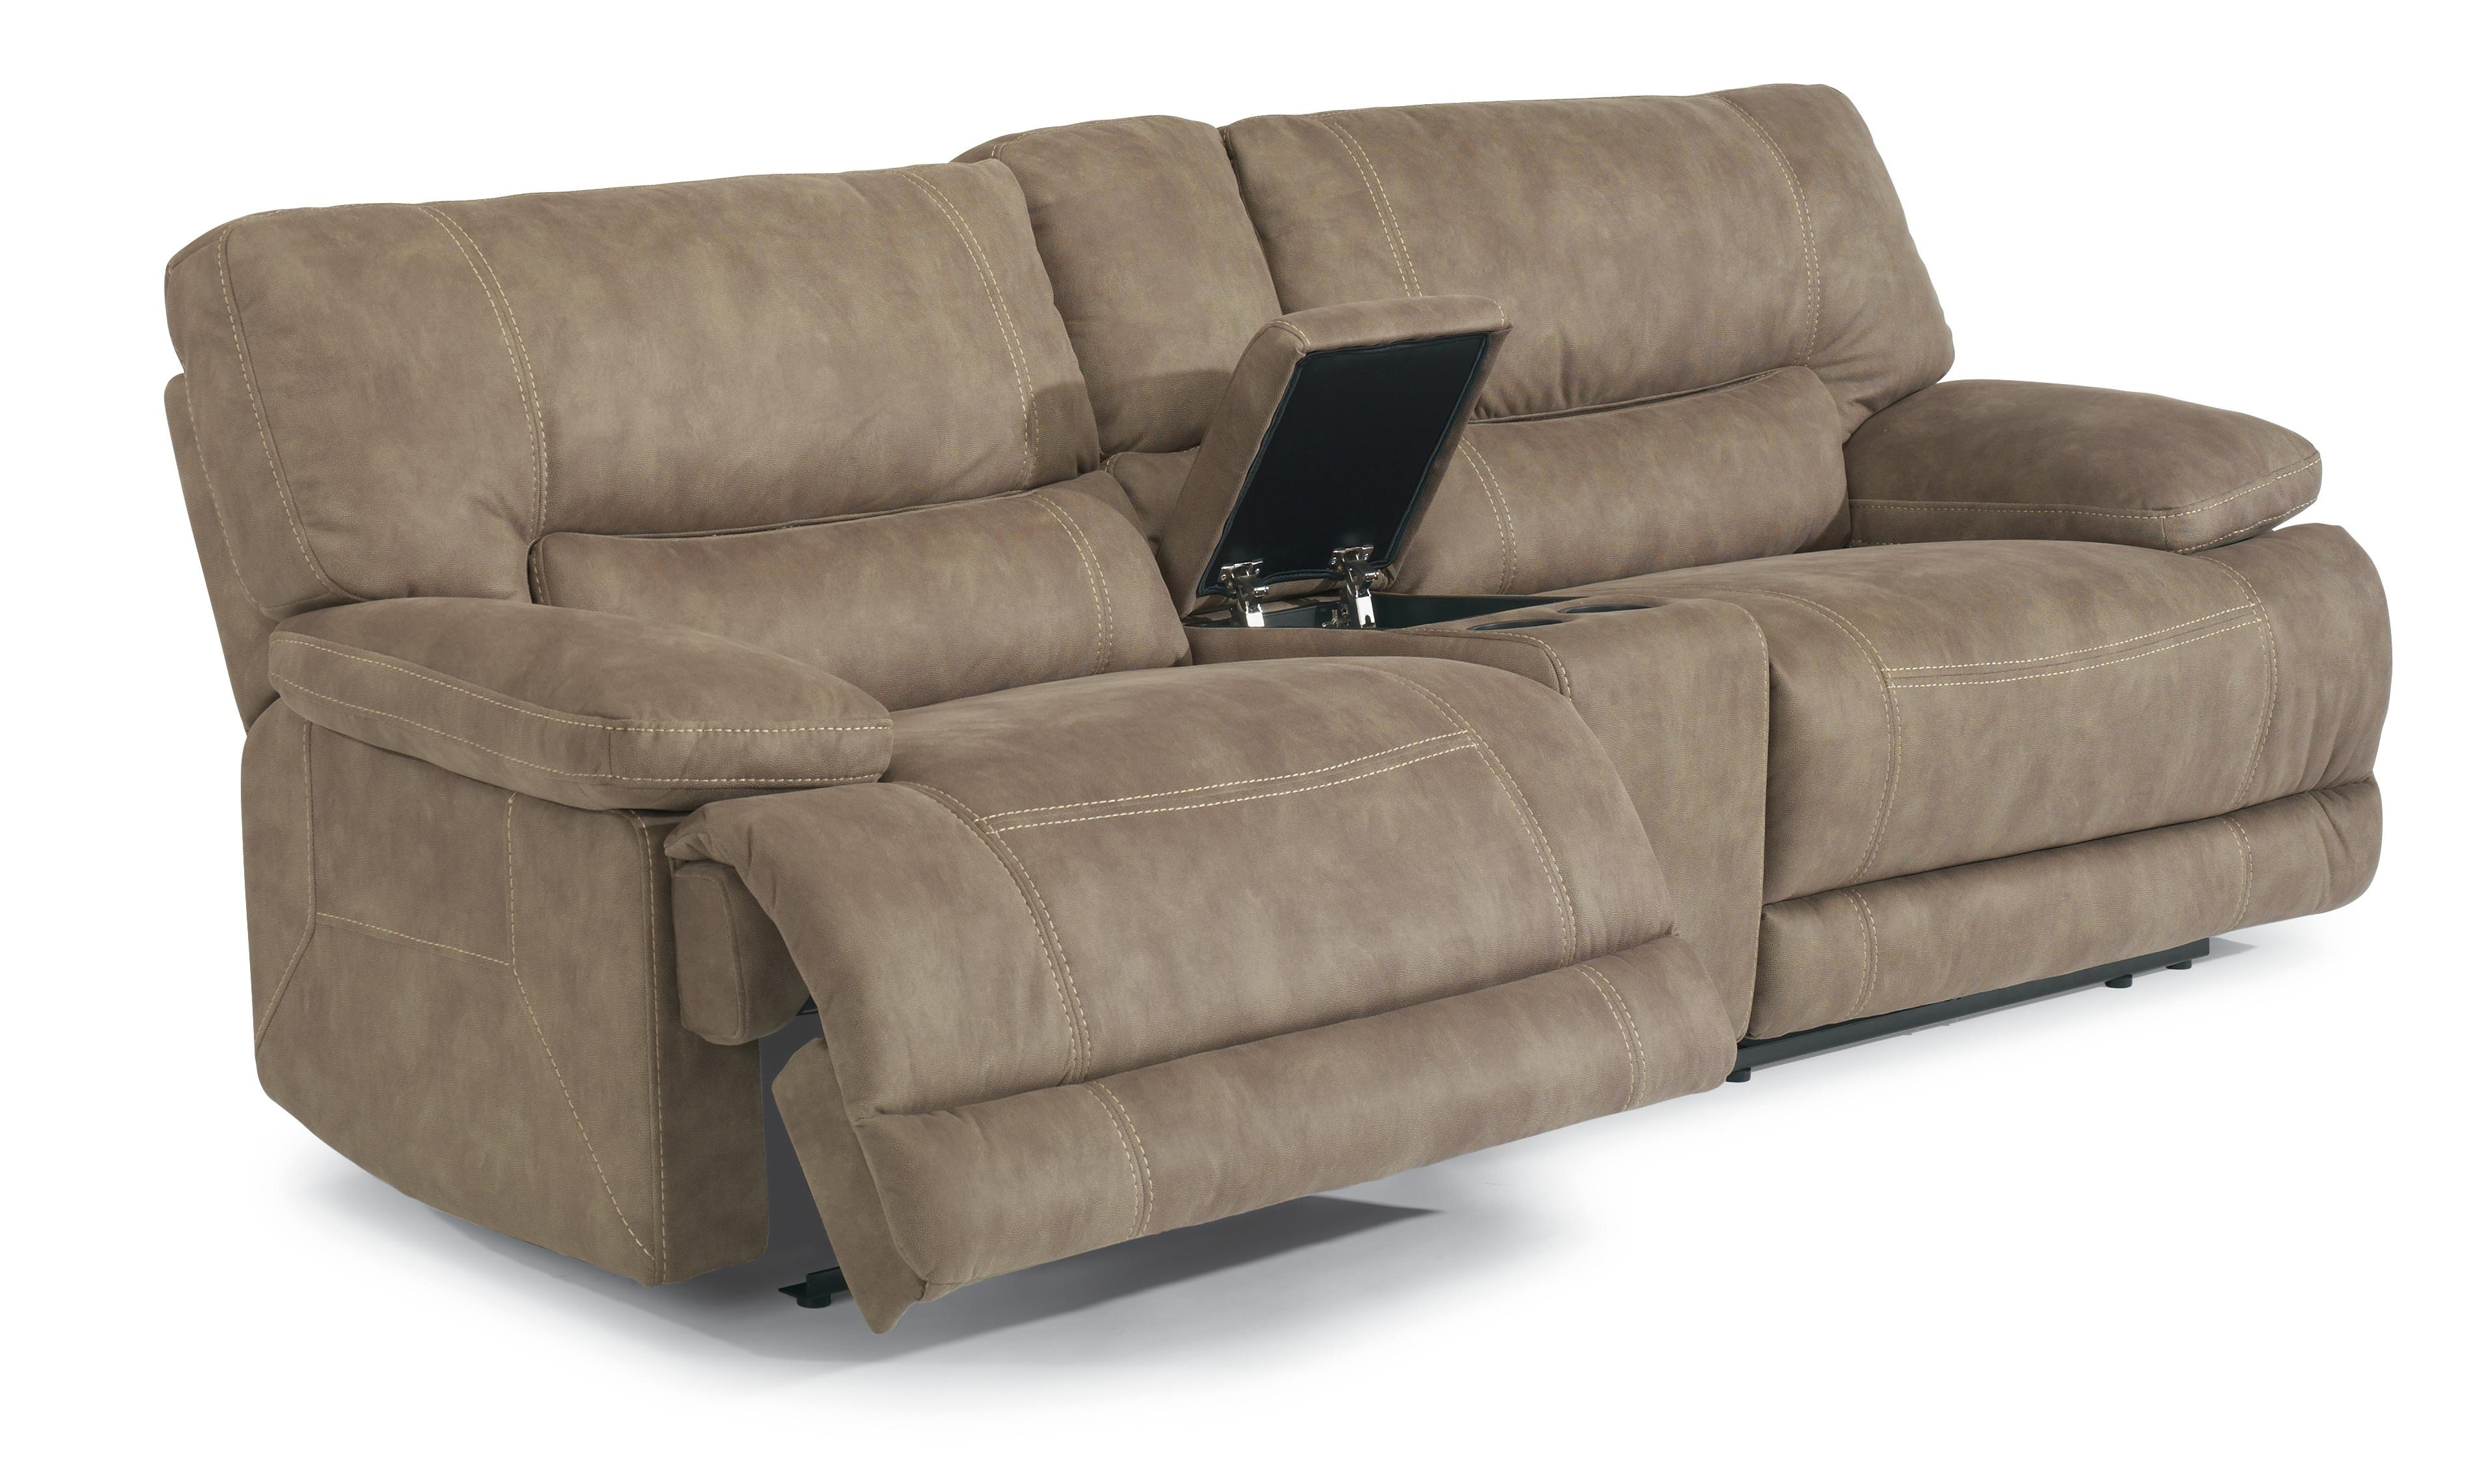 leather possibilities track arm sofa poeten finn juhl kaufen flexsteel latitudes delia power reclining sectional